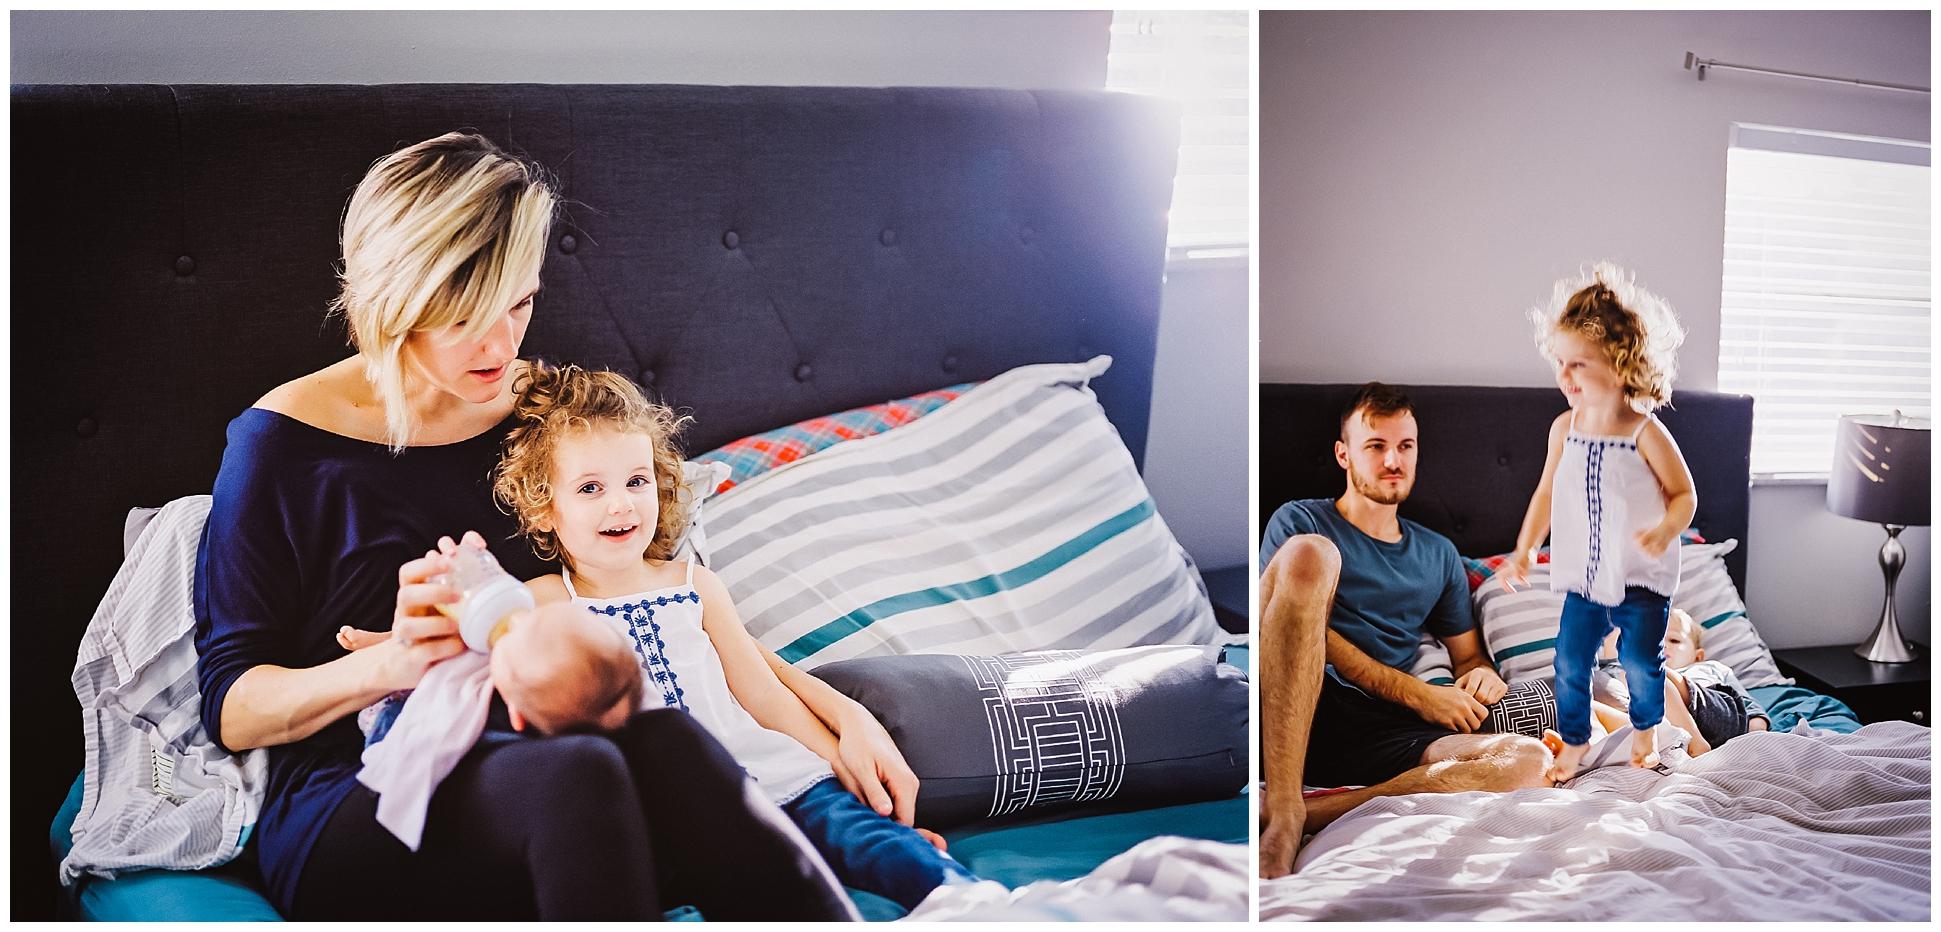 tampa-lifestyle-portrait-photographer-in-home-pentax-film-vs-digital_0013.jpg